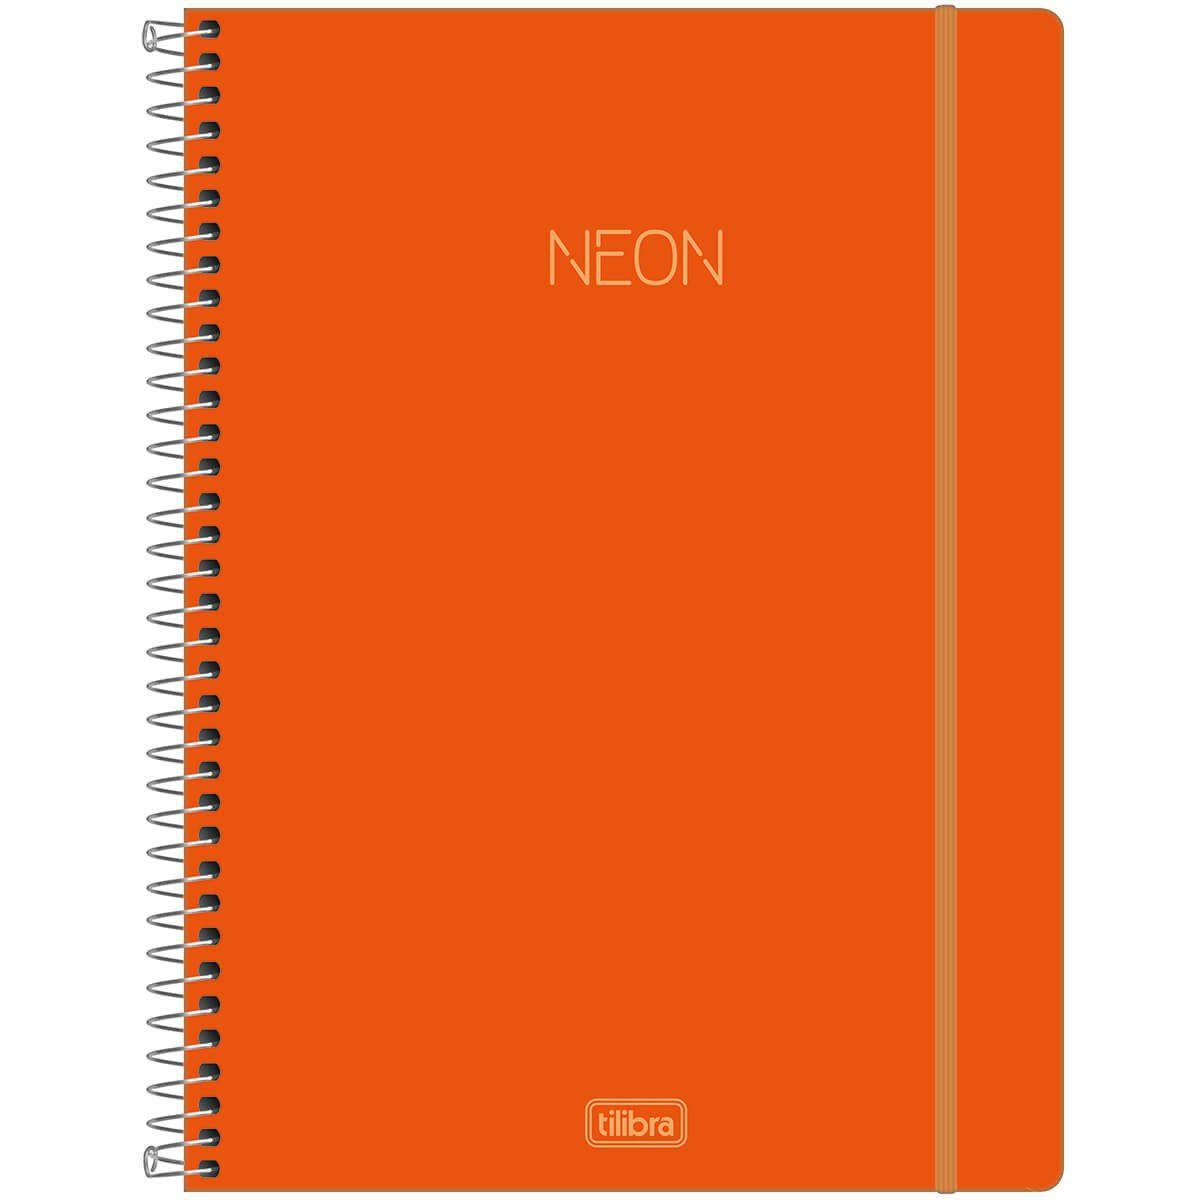 Caderno universitário 1 matéria 80 fls Neon laranja Tilibra